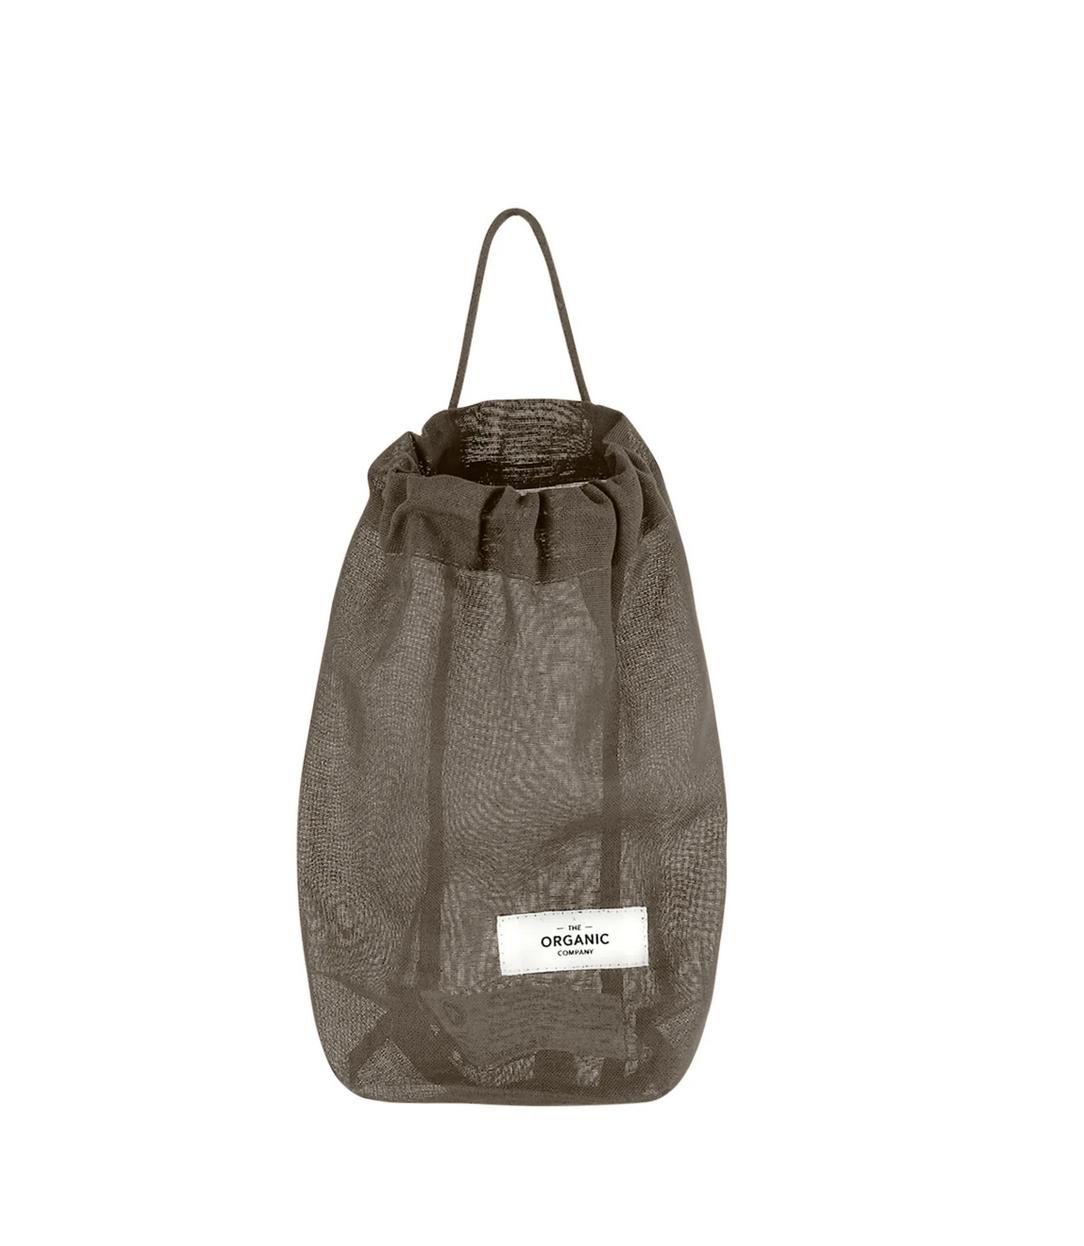 Set Multifunctionele Tassen - Clay - The Organic Company-1